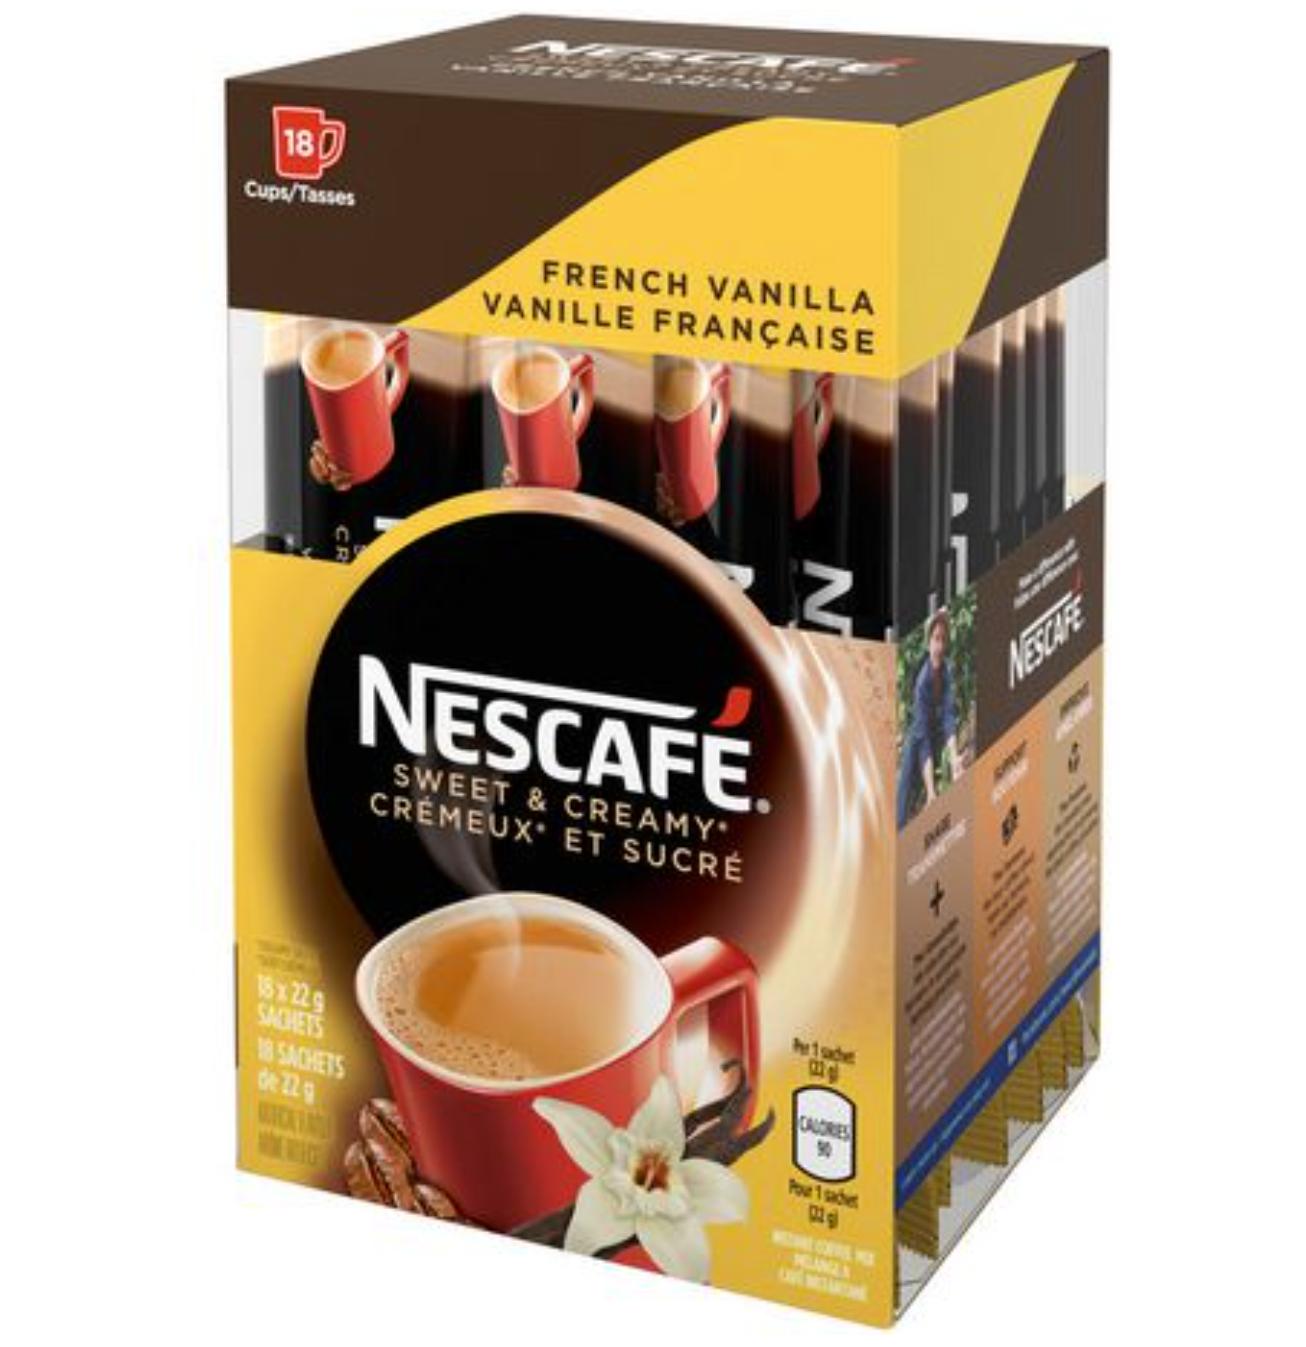 NESCAFÉ Sweet & Creamy French Vanilla, Instant Coffee Sachets (18 x 19 g) - $19.97